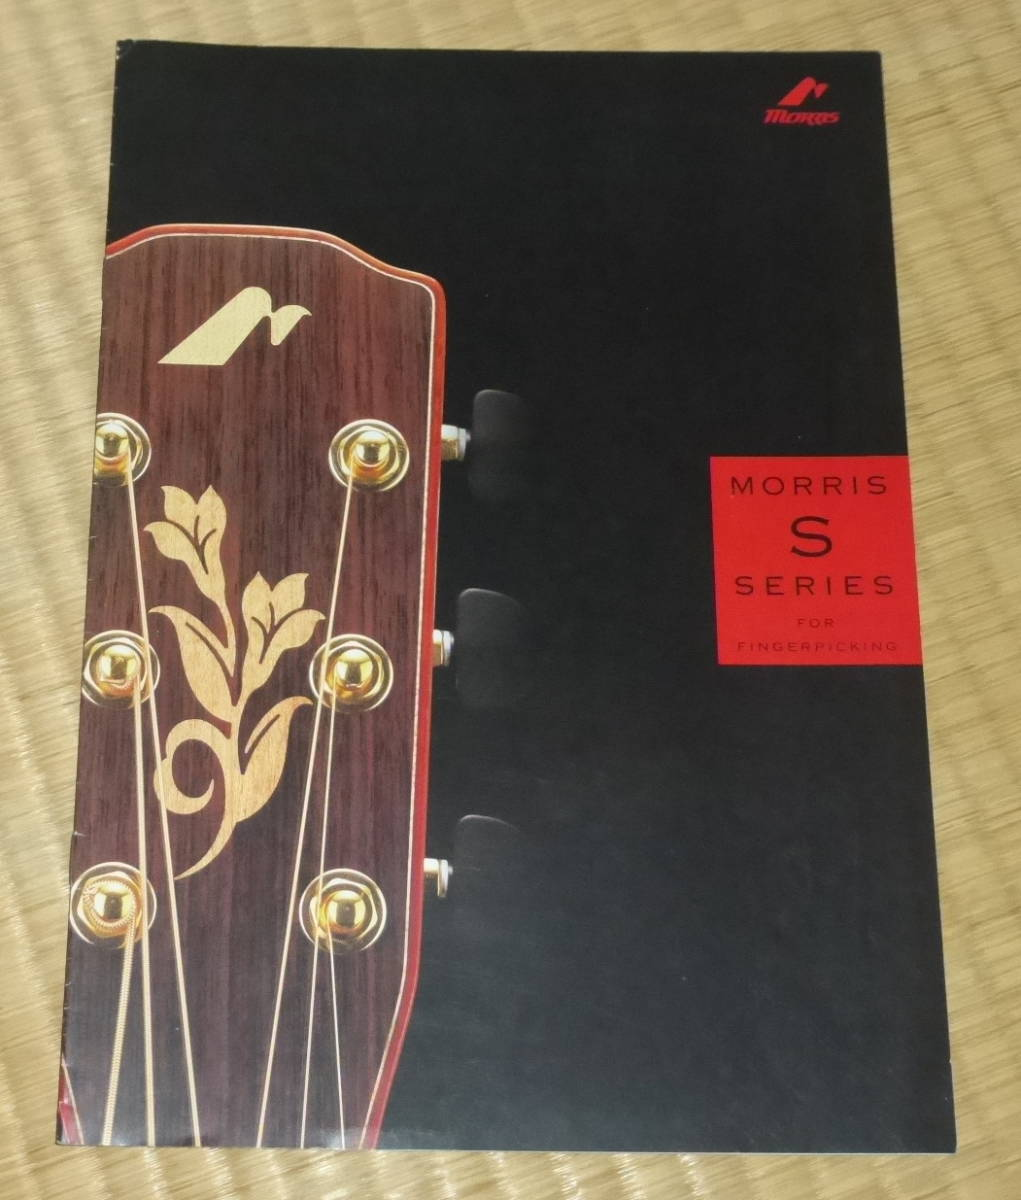 MORRIS ACOUSTIC GUITARS Catalog S SERIES ☆ モーリス アコースティック・ギターカタログ_画像1